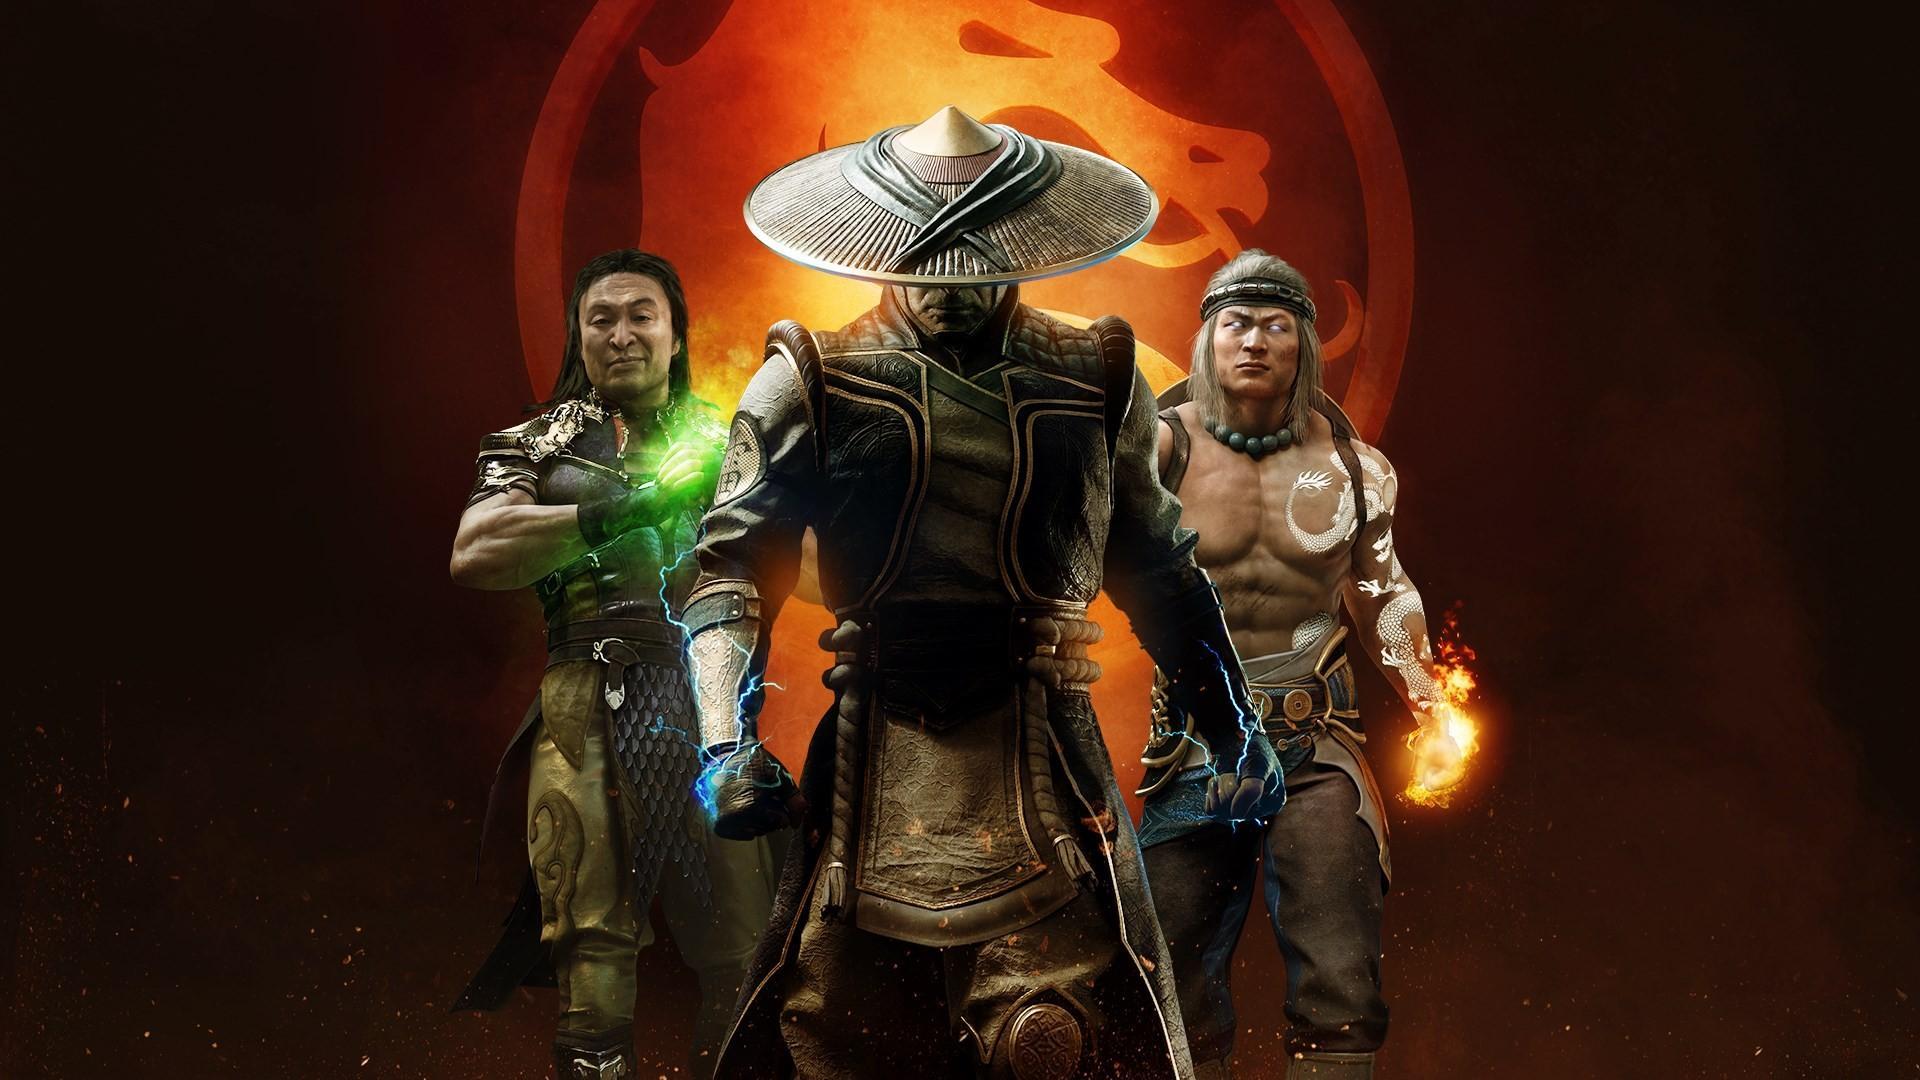 Mortal Kombat 11: Aftermath 10